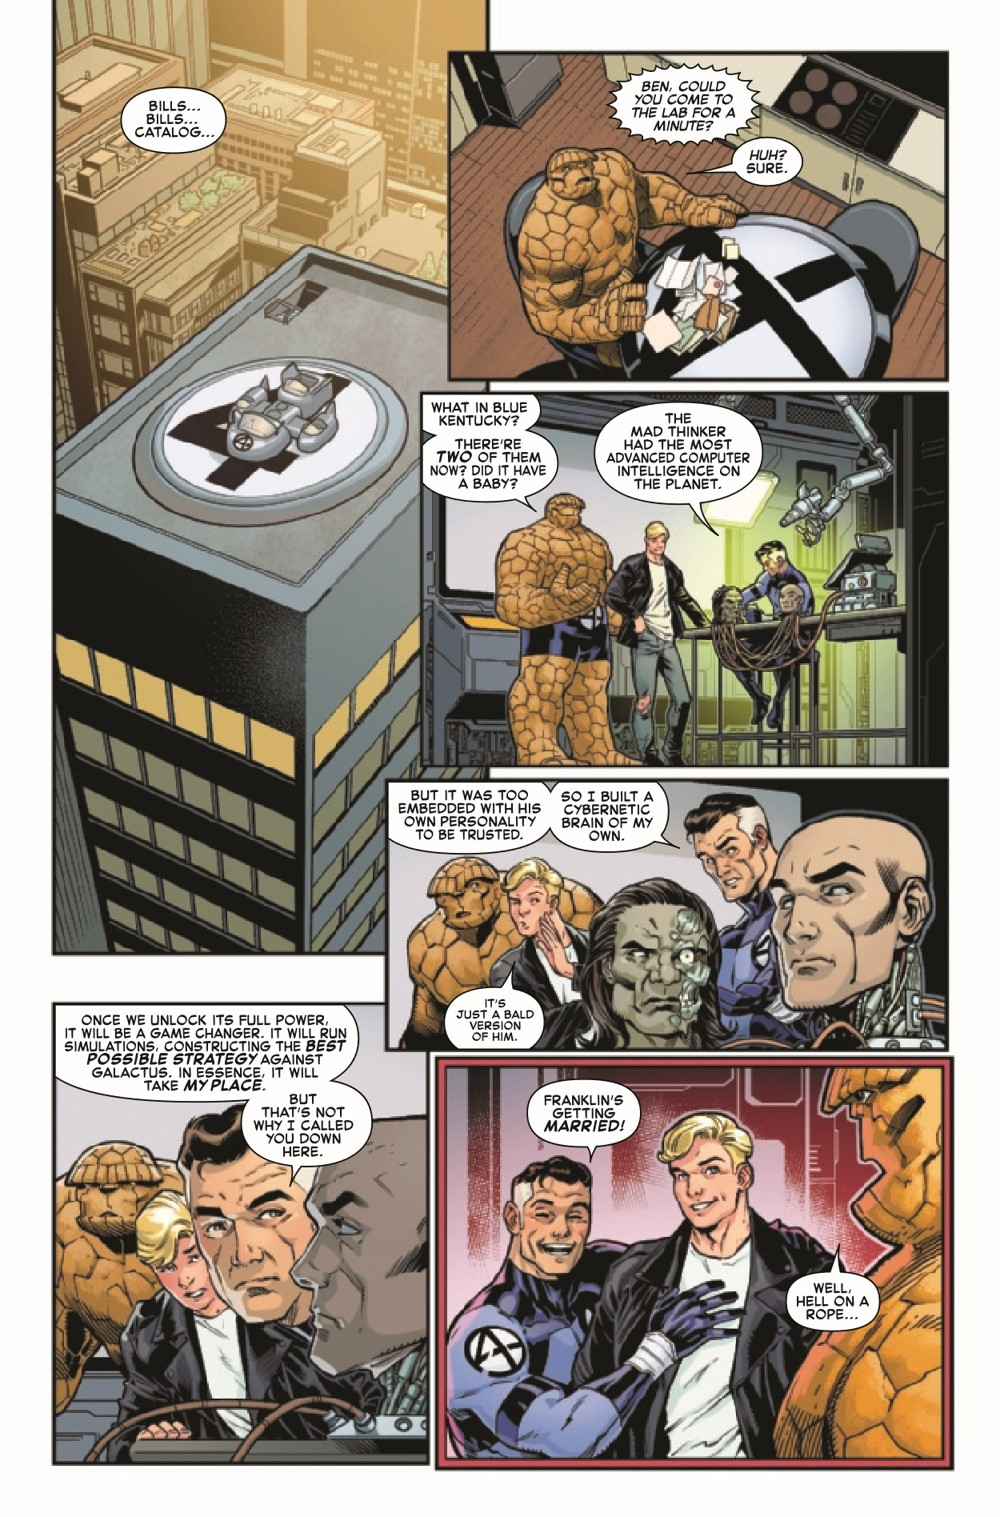 FFLIFESTORY2019004_Preview-6 ComicList Previews: FANTASTIC FOUR LIFE STORY #4 (OF 6)